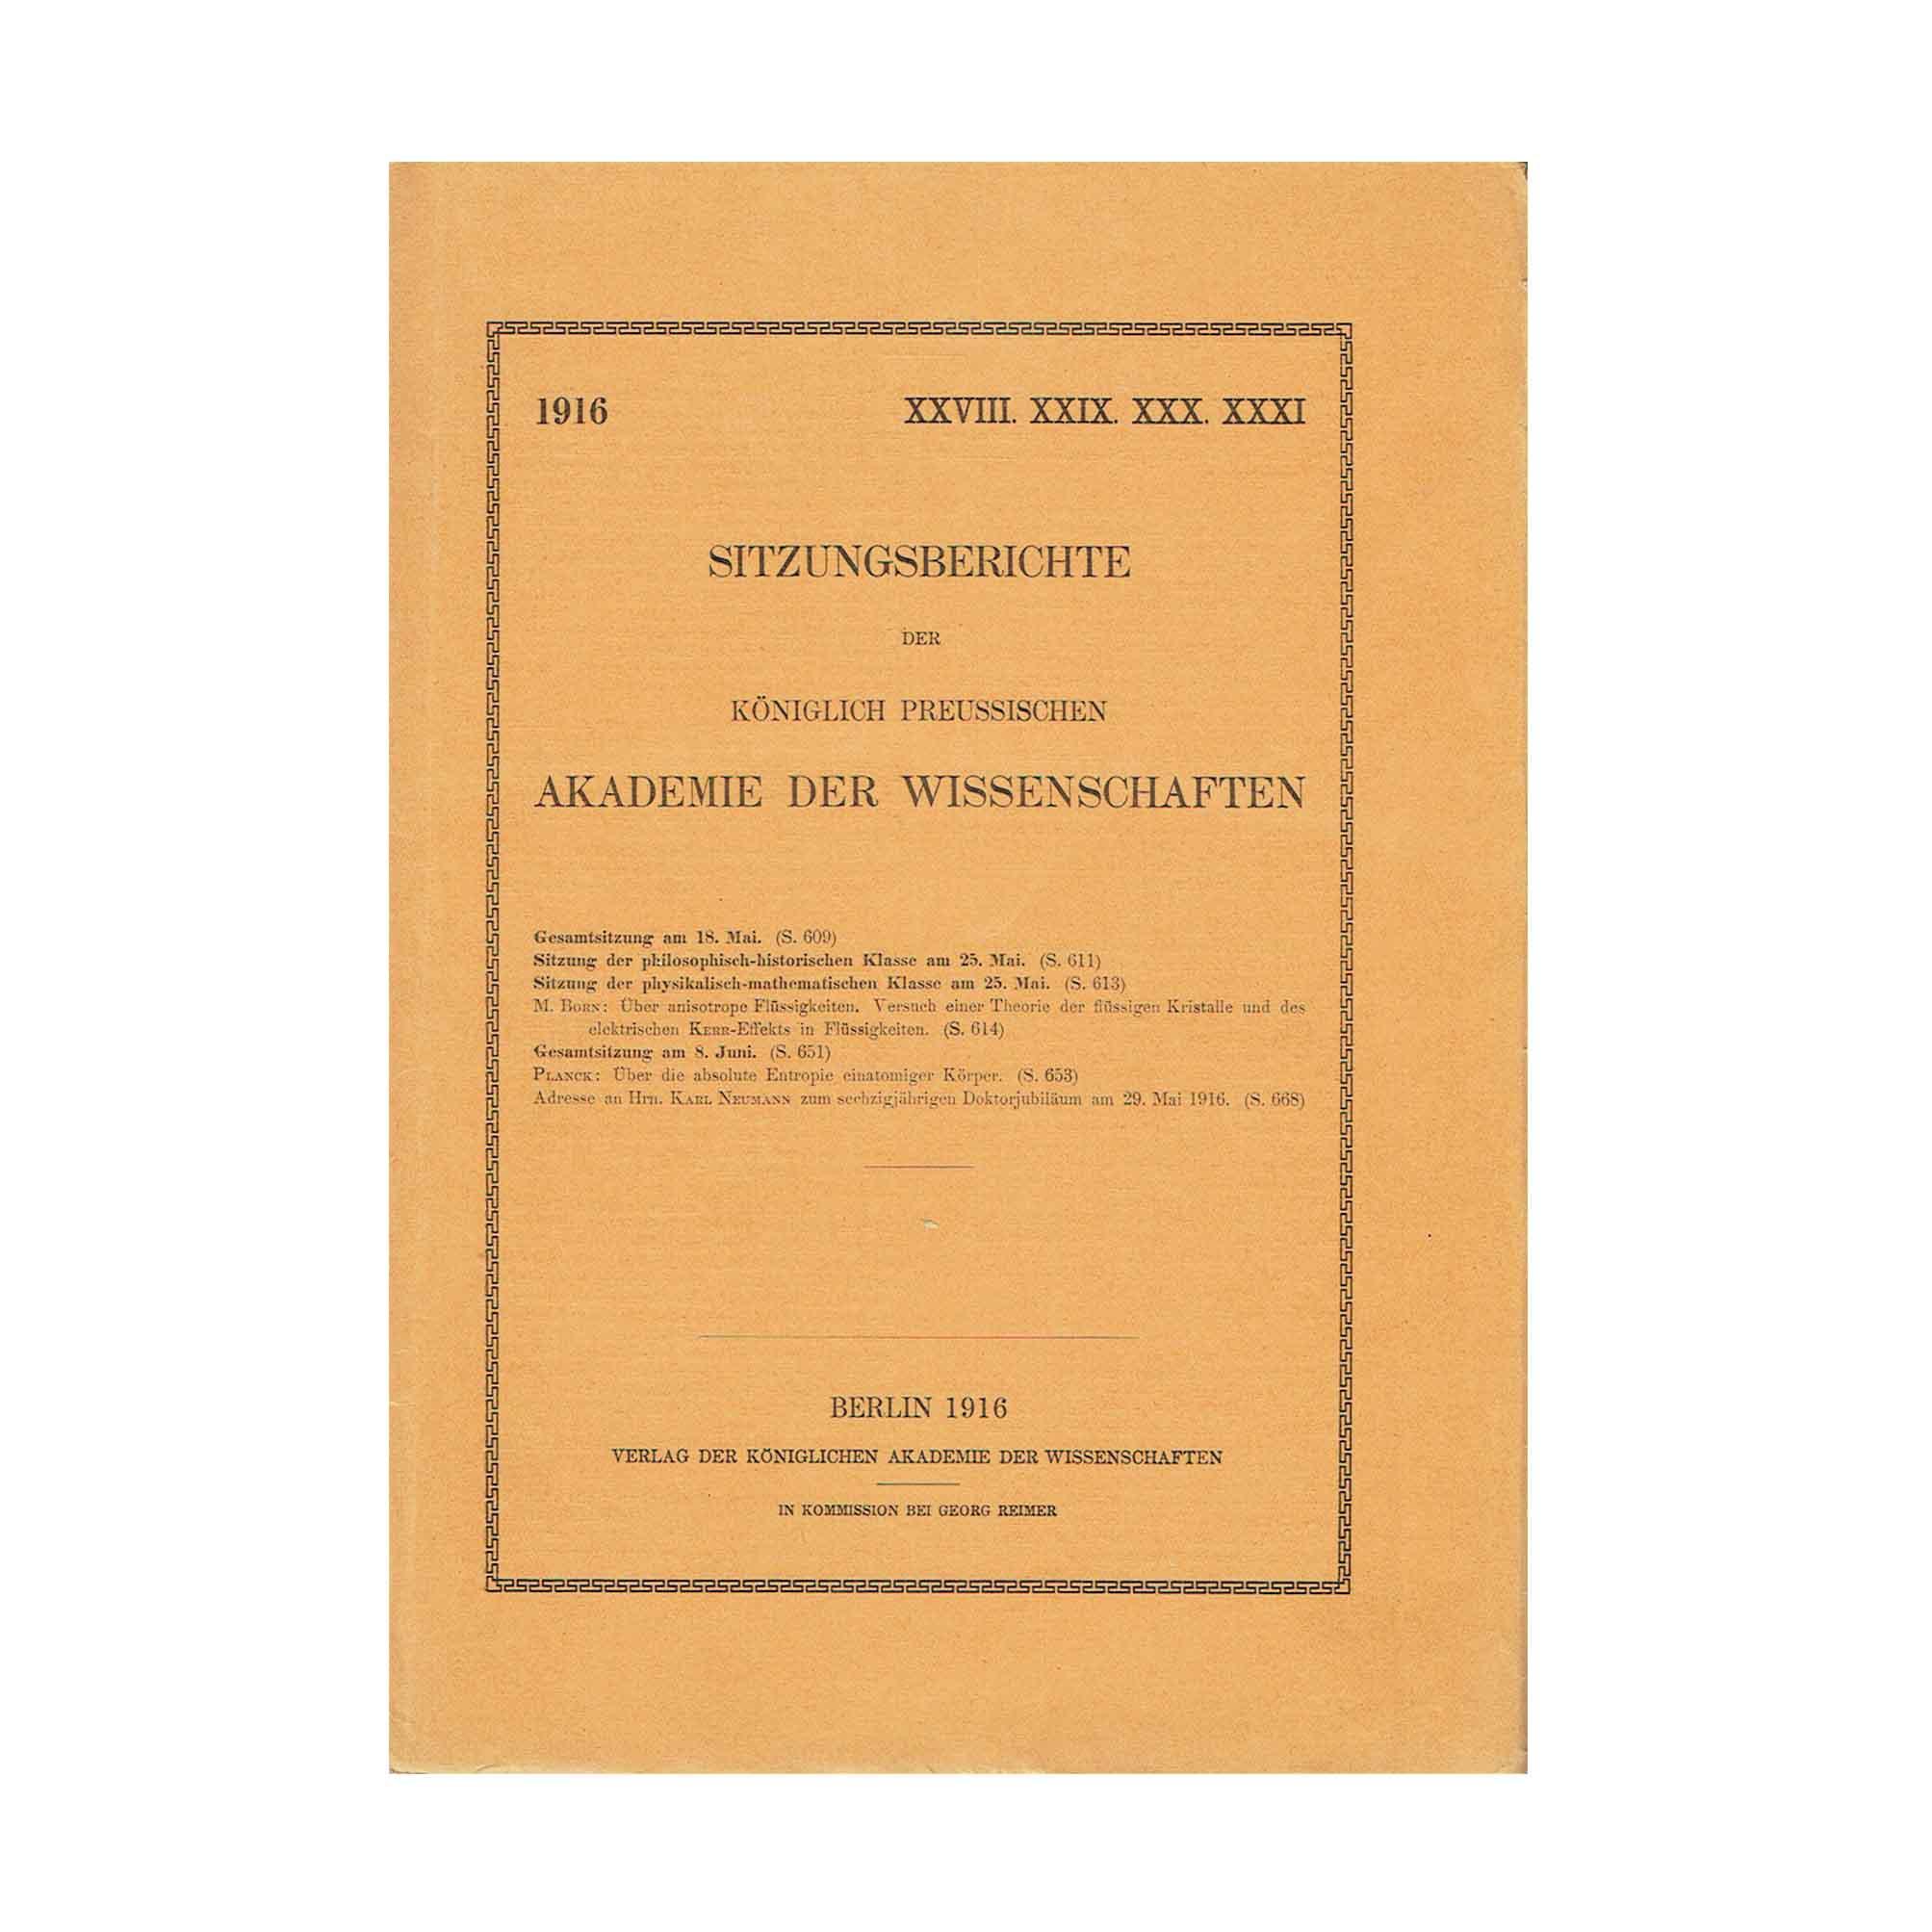 5821K-Planck-Entropie-Koerper-First-Separate-1916-Front-Cover-N.jpeg